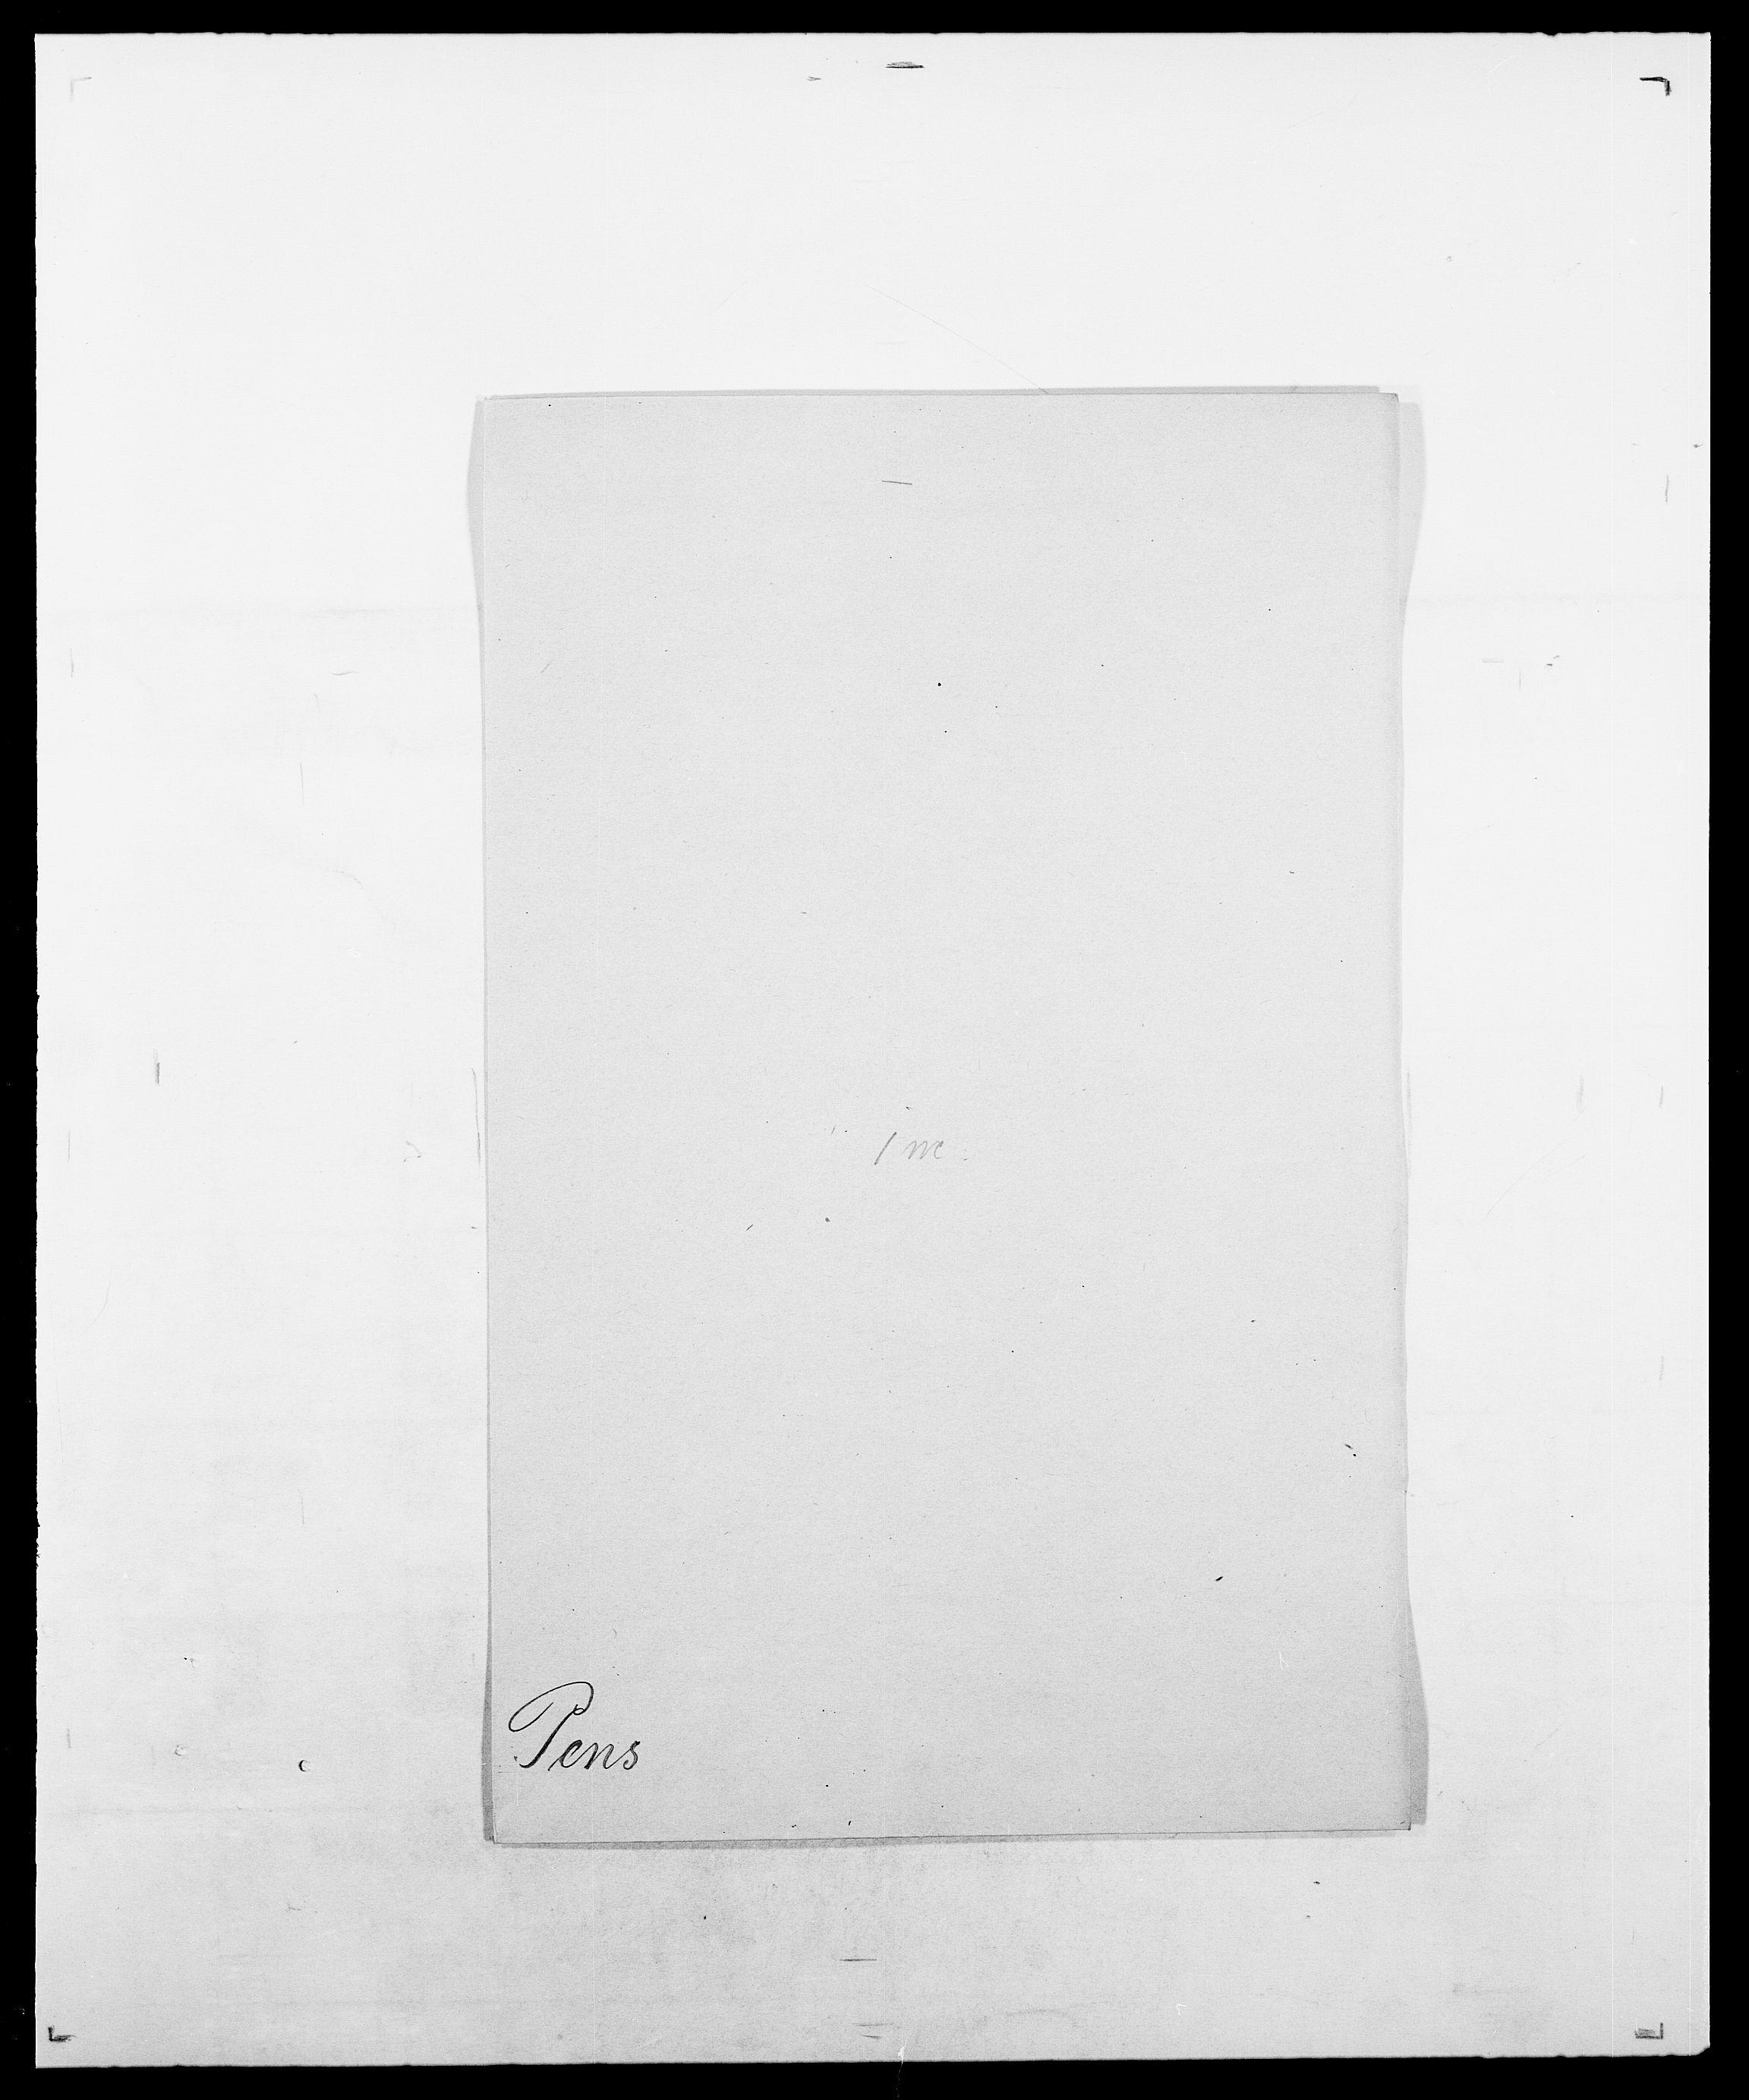 SAO, Delgobe, Charles Antoine - samling, D/Da/L0030: Paars - Pittelkov, s. 349